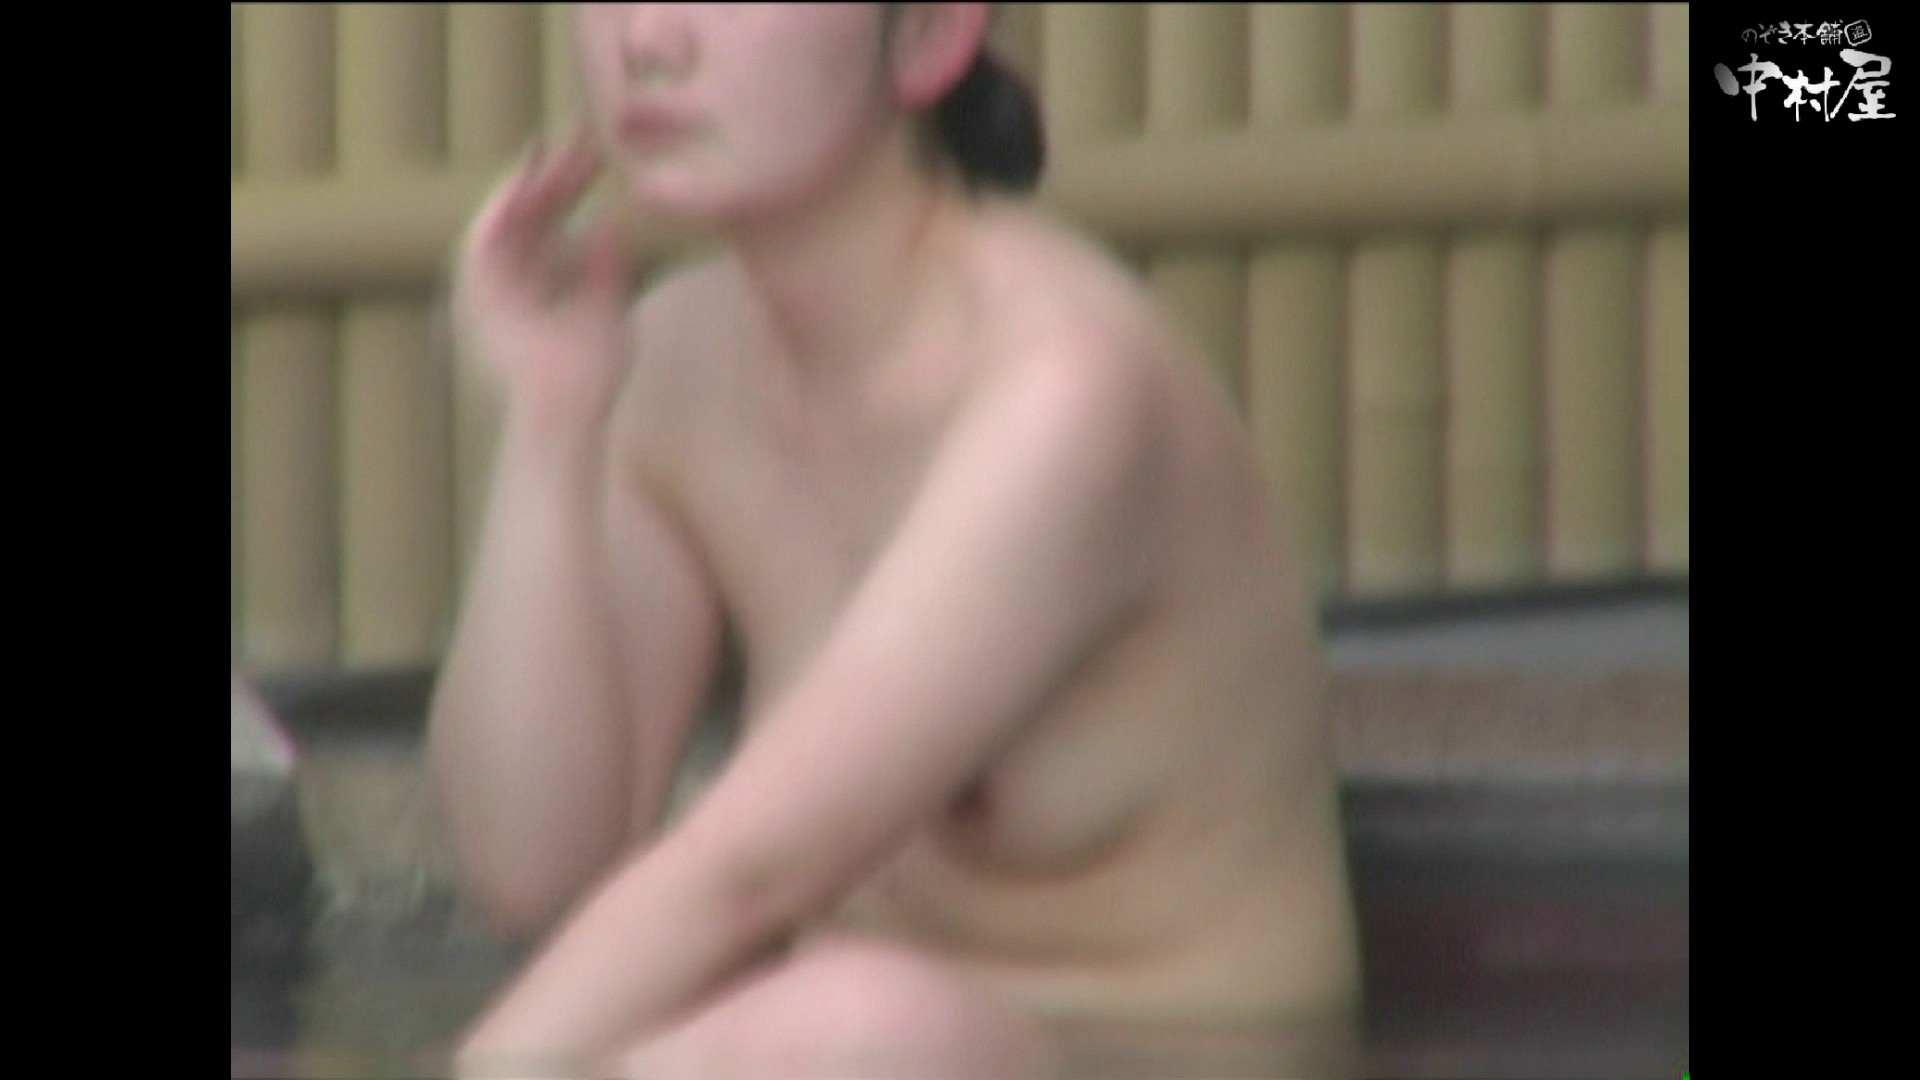 Aquaな露天風呂Vol.892 露天   OLセックス  80画像 43